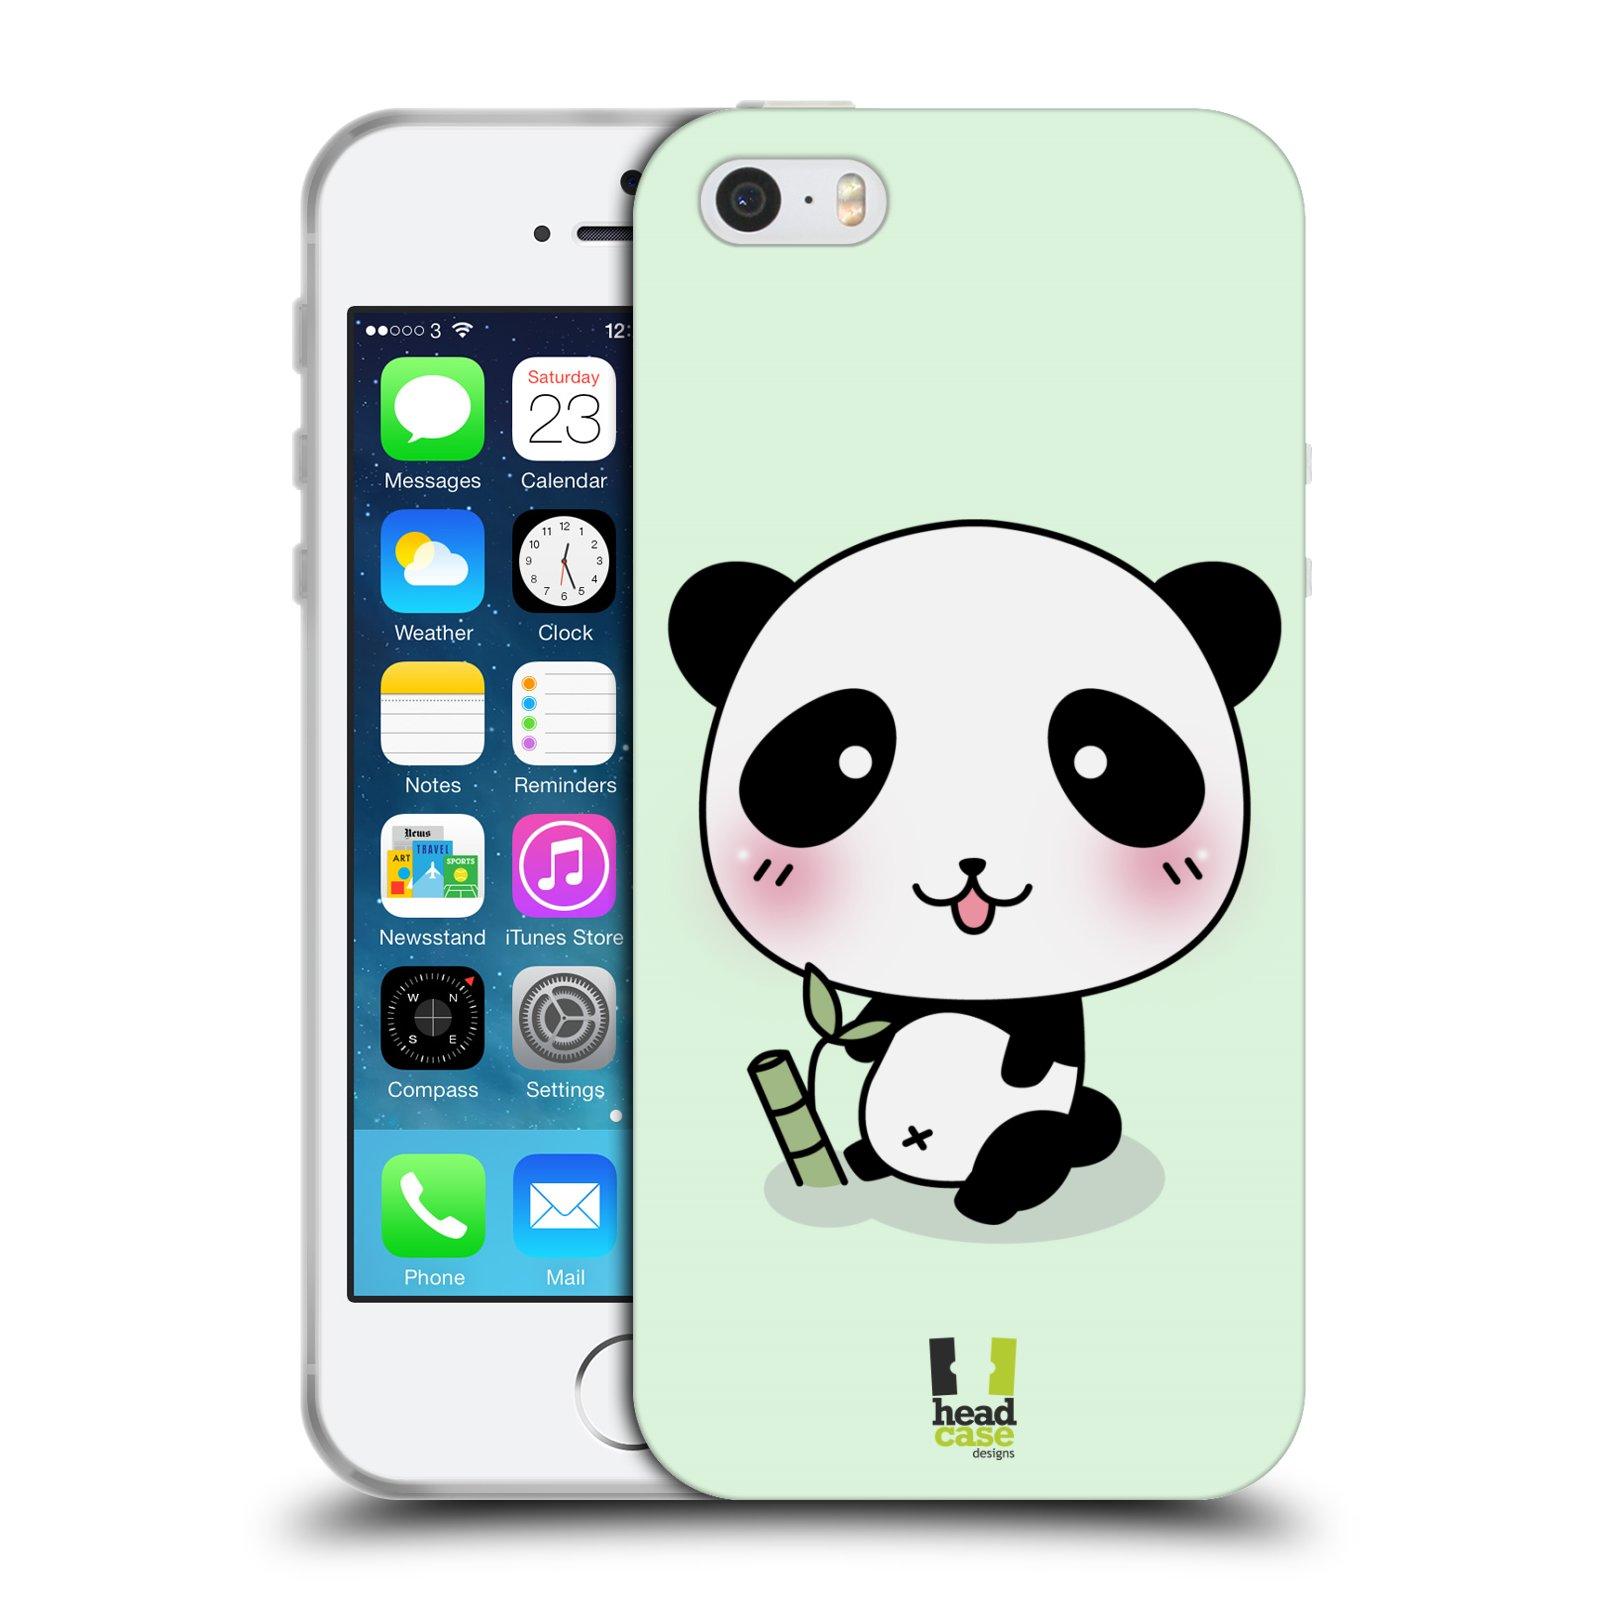 HEAD CASE silikonový obal na mobil Apple Iphone 5 5S vzor Roztomilá panda  zelená 7c69a2bb2b8